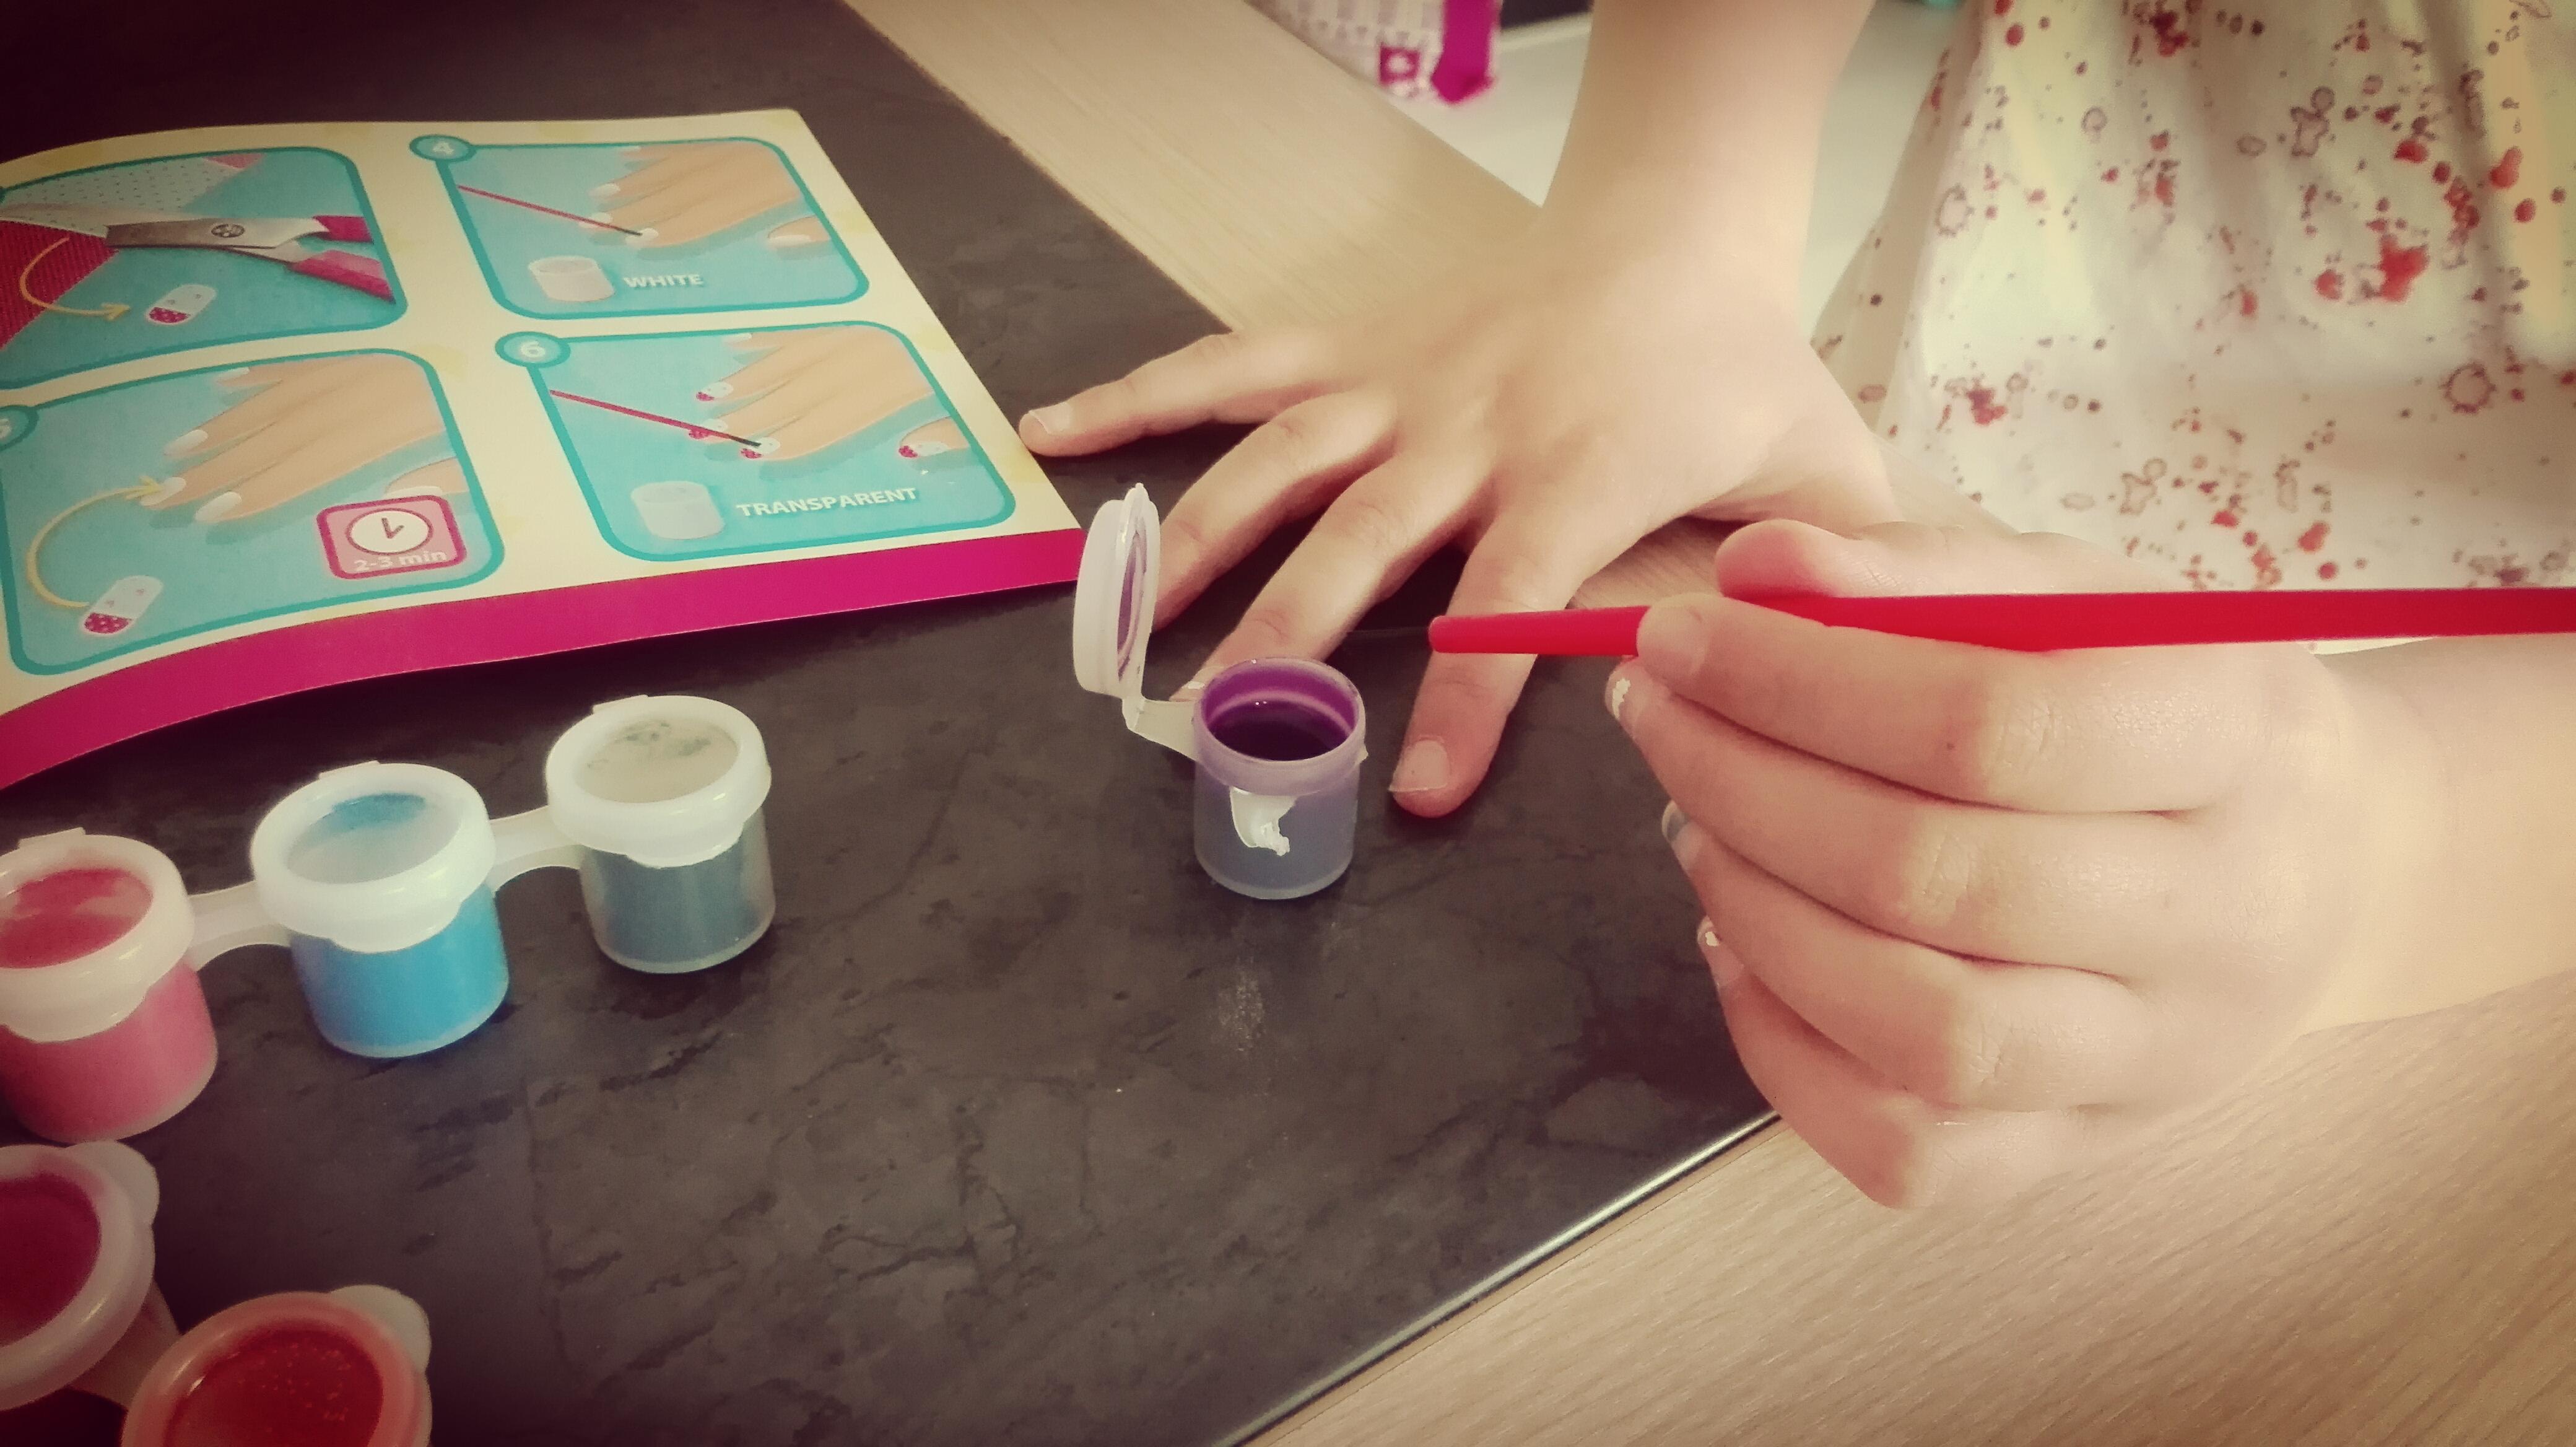 Ses Creative meisjes knutselen nagels versieren nagellak voor kinderen glitters instructieboekje nanny annelon meiden middag lekker friemelen en mooi make4